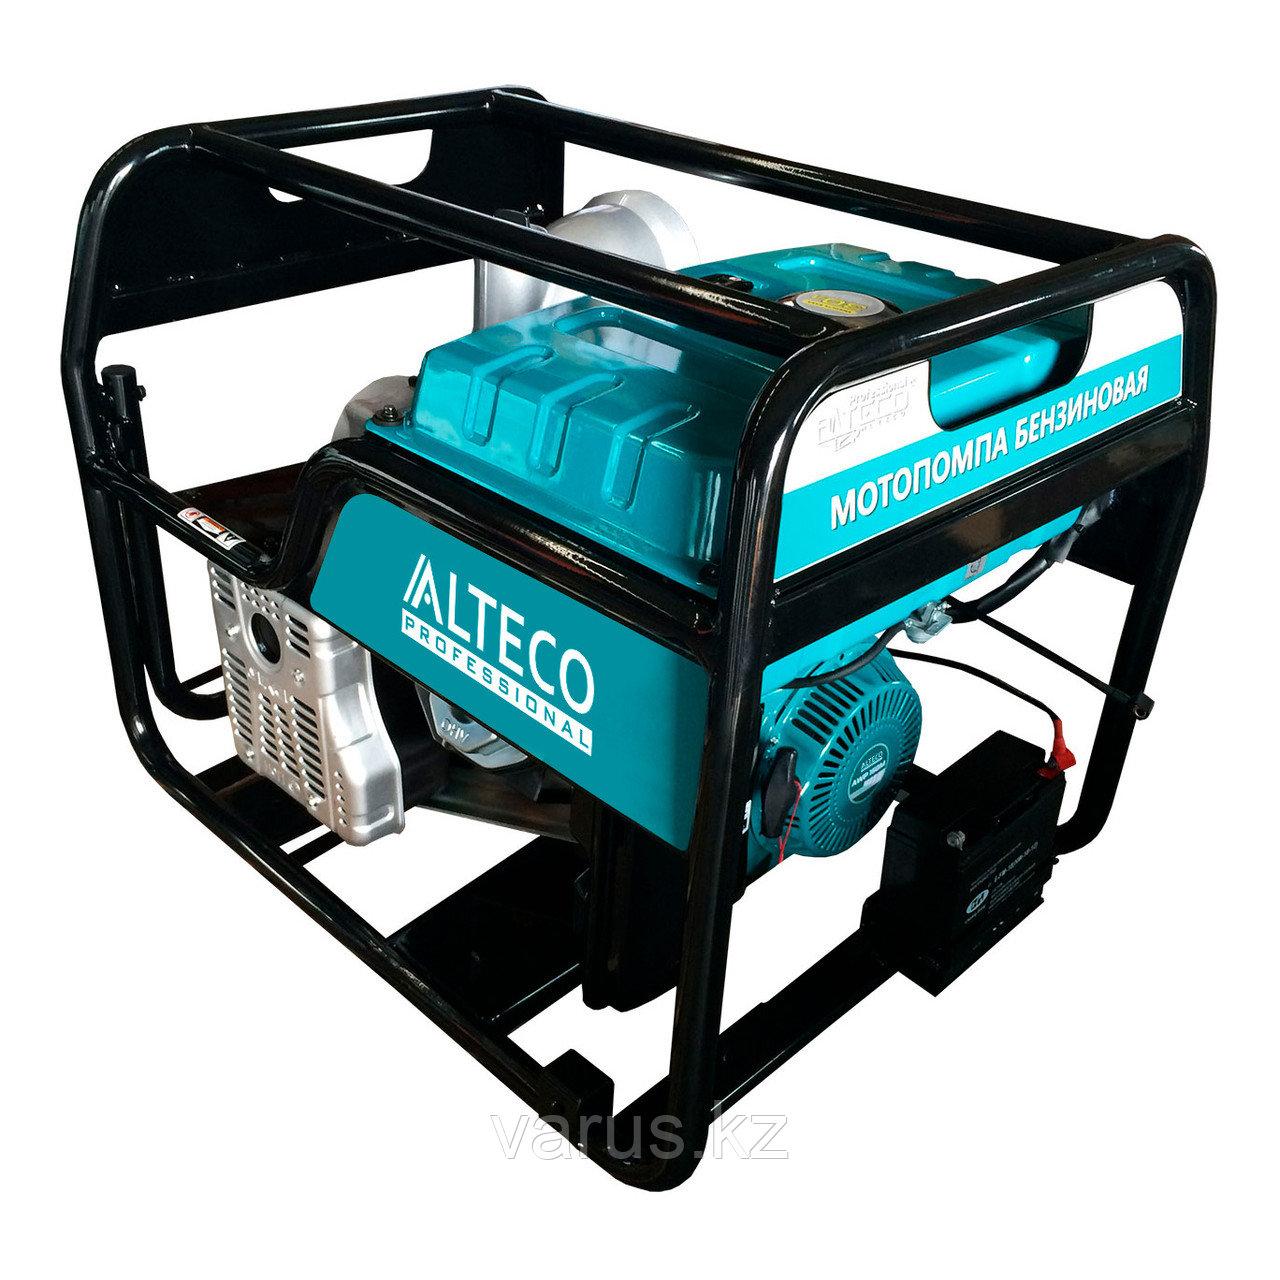 Мотопомпа бензиновая Alteco Professional AWP150M